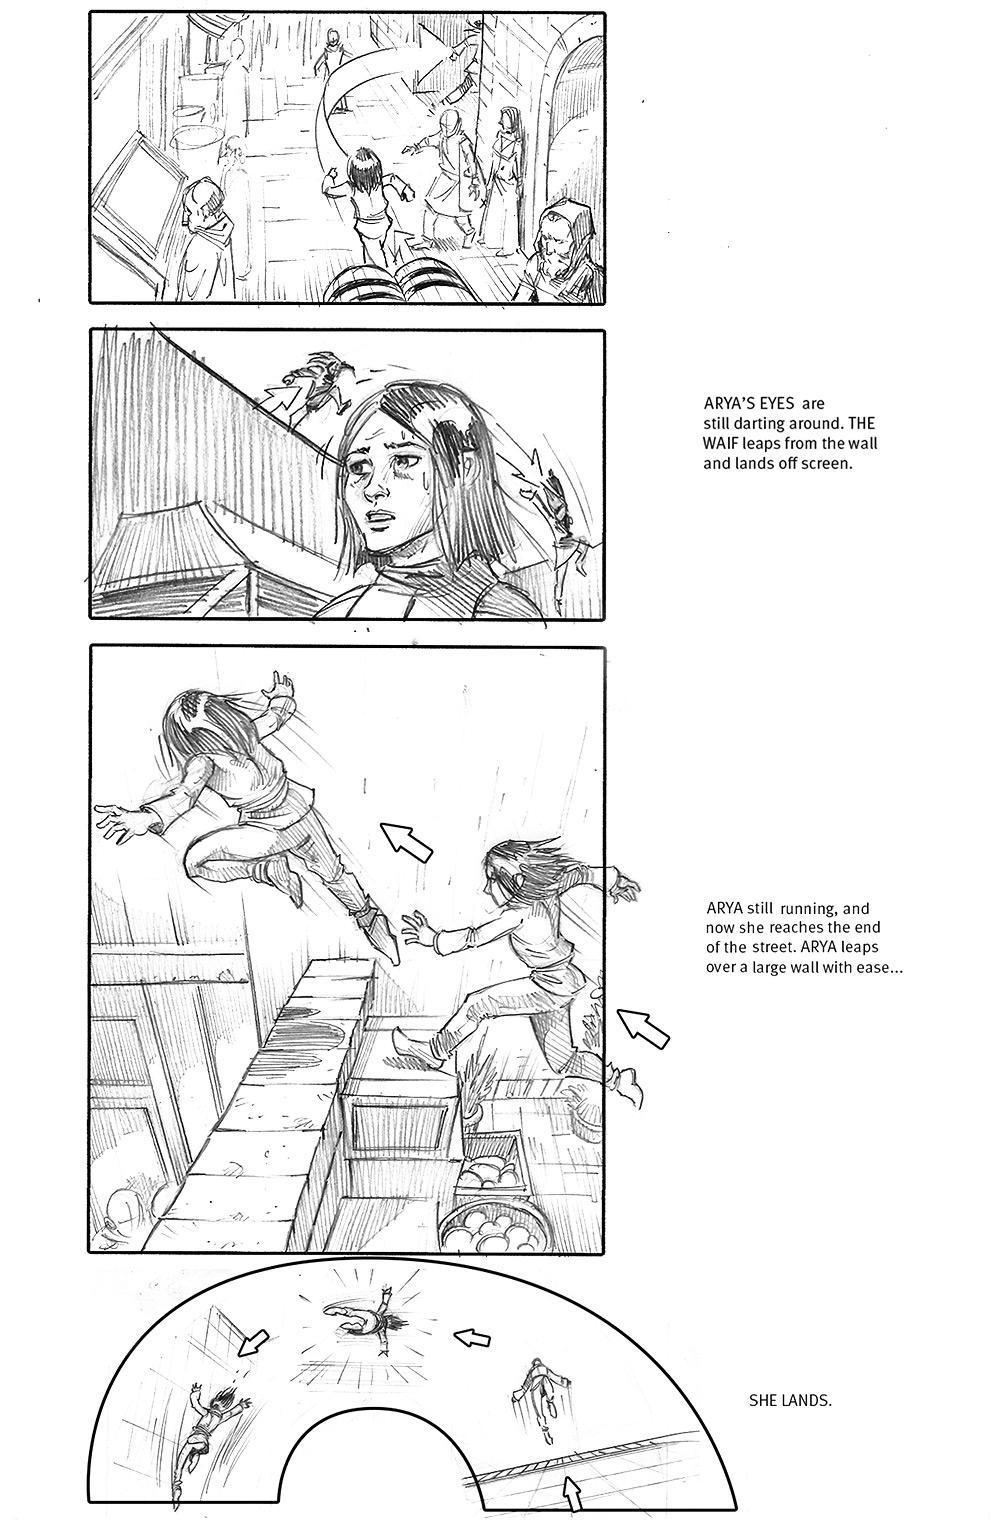 Arya storyboard